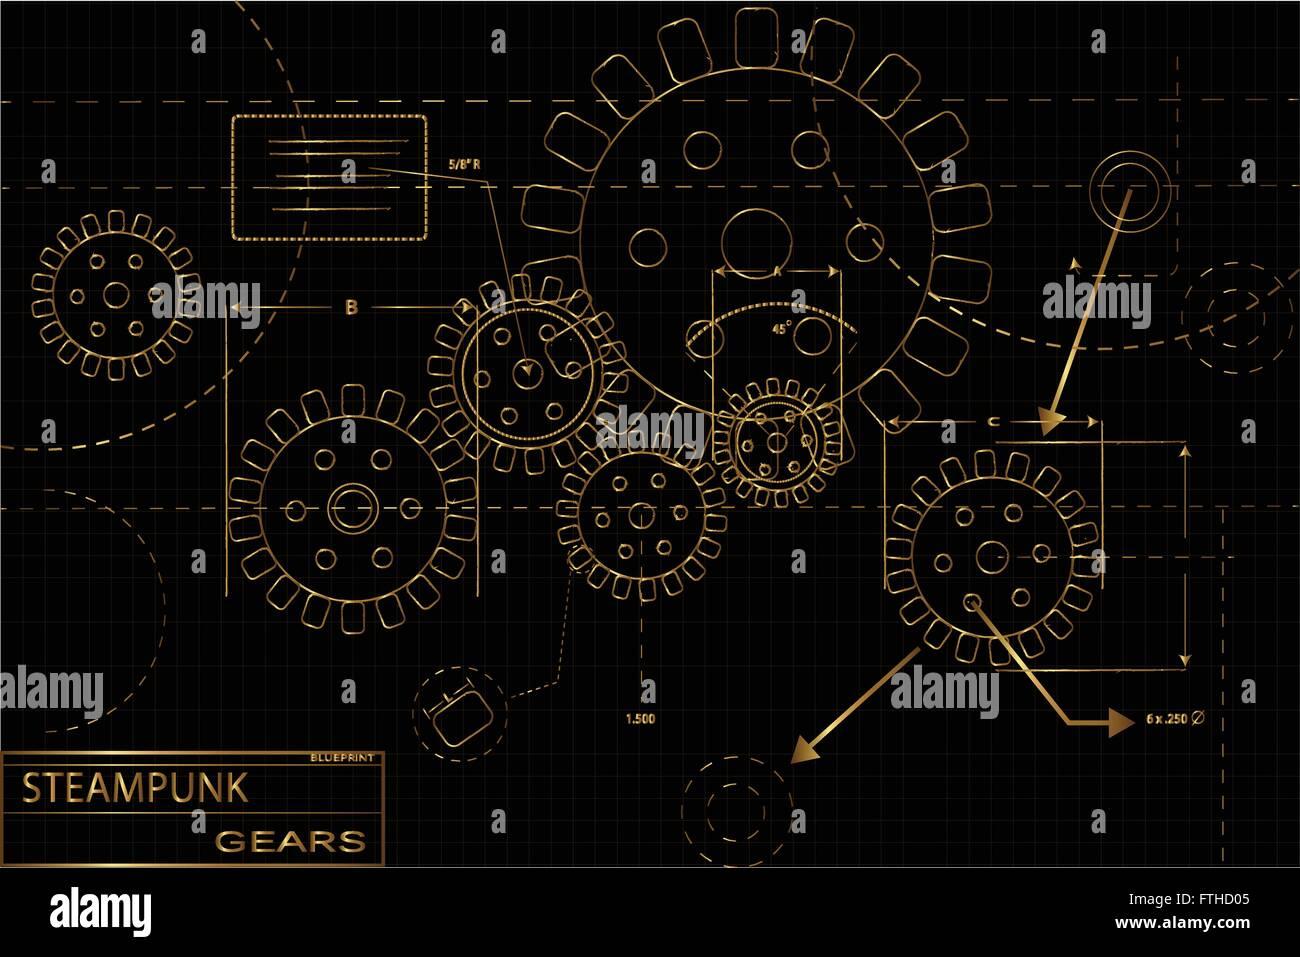 Steampunk Vectors Stockfotos & Steampunk Vectors Bilder - Alamy